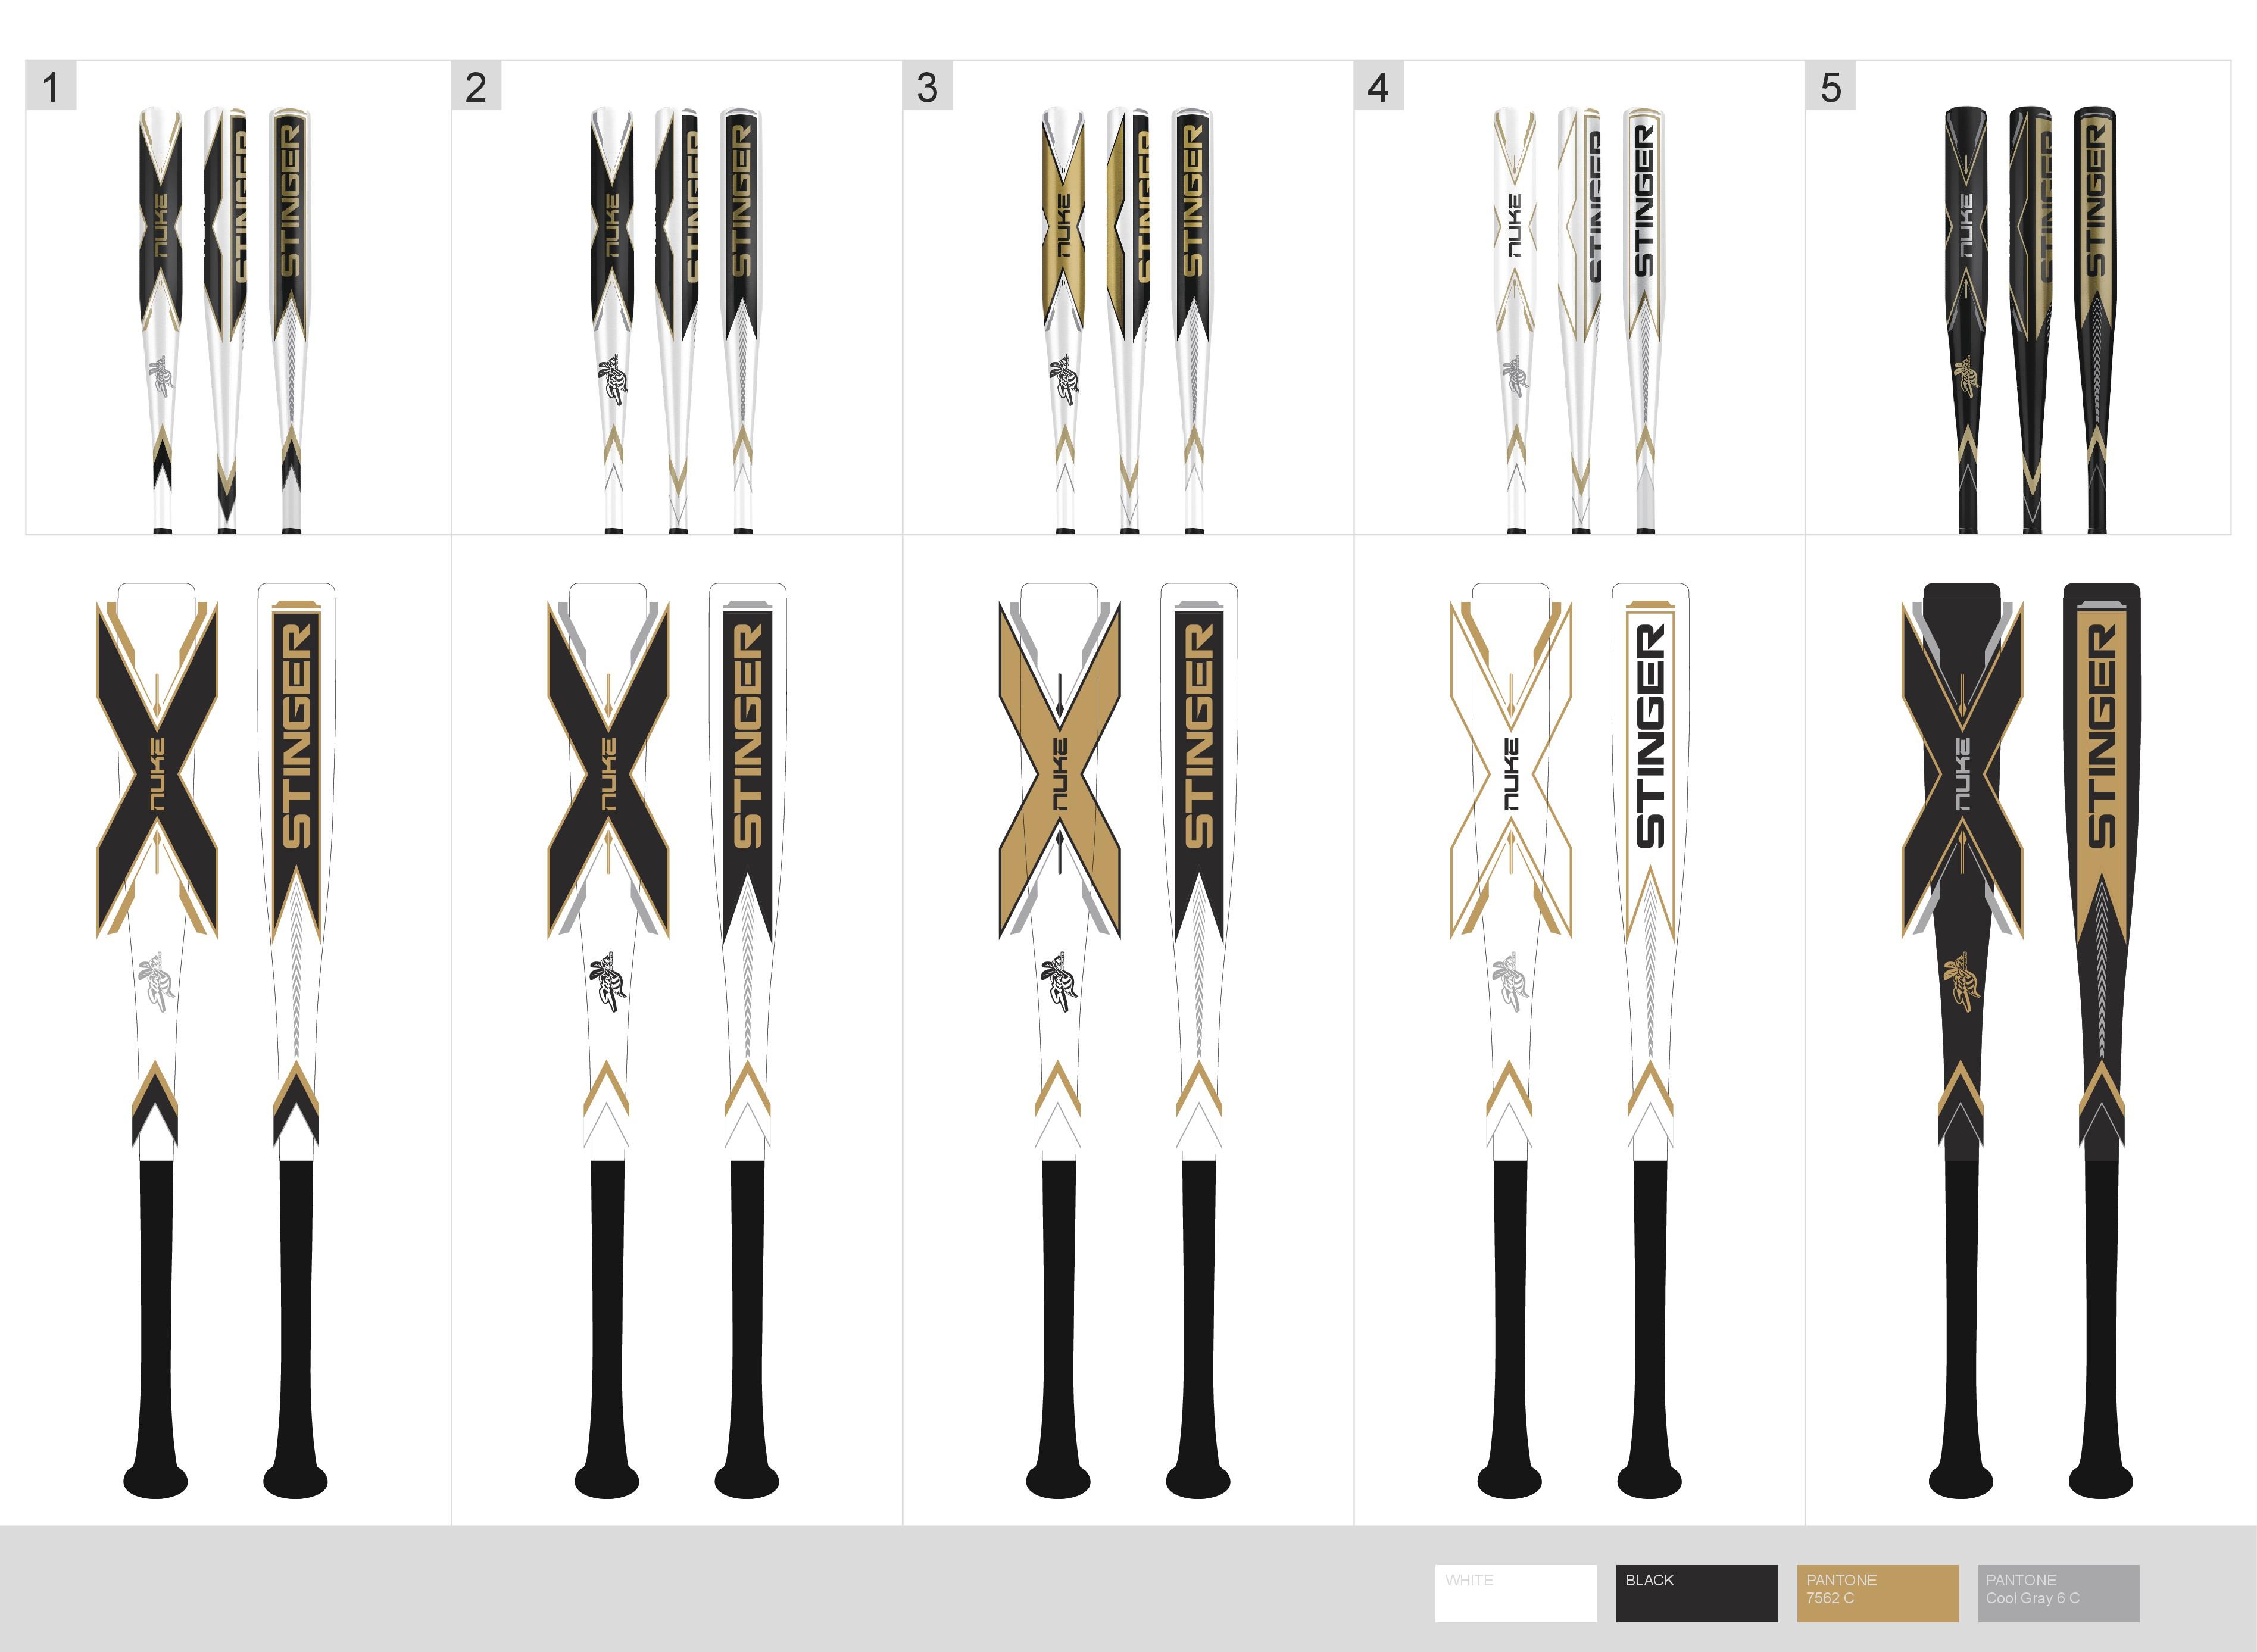 Design Sleek Baseball Bat Graphics for new product